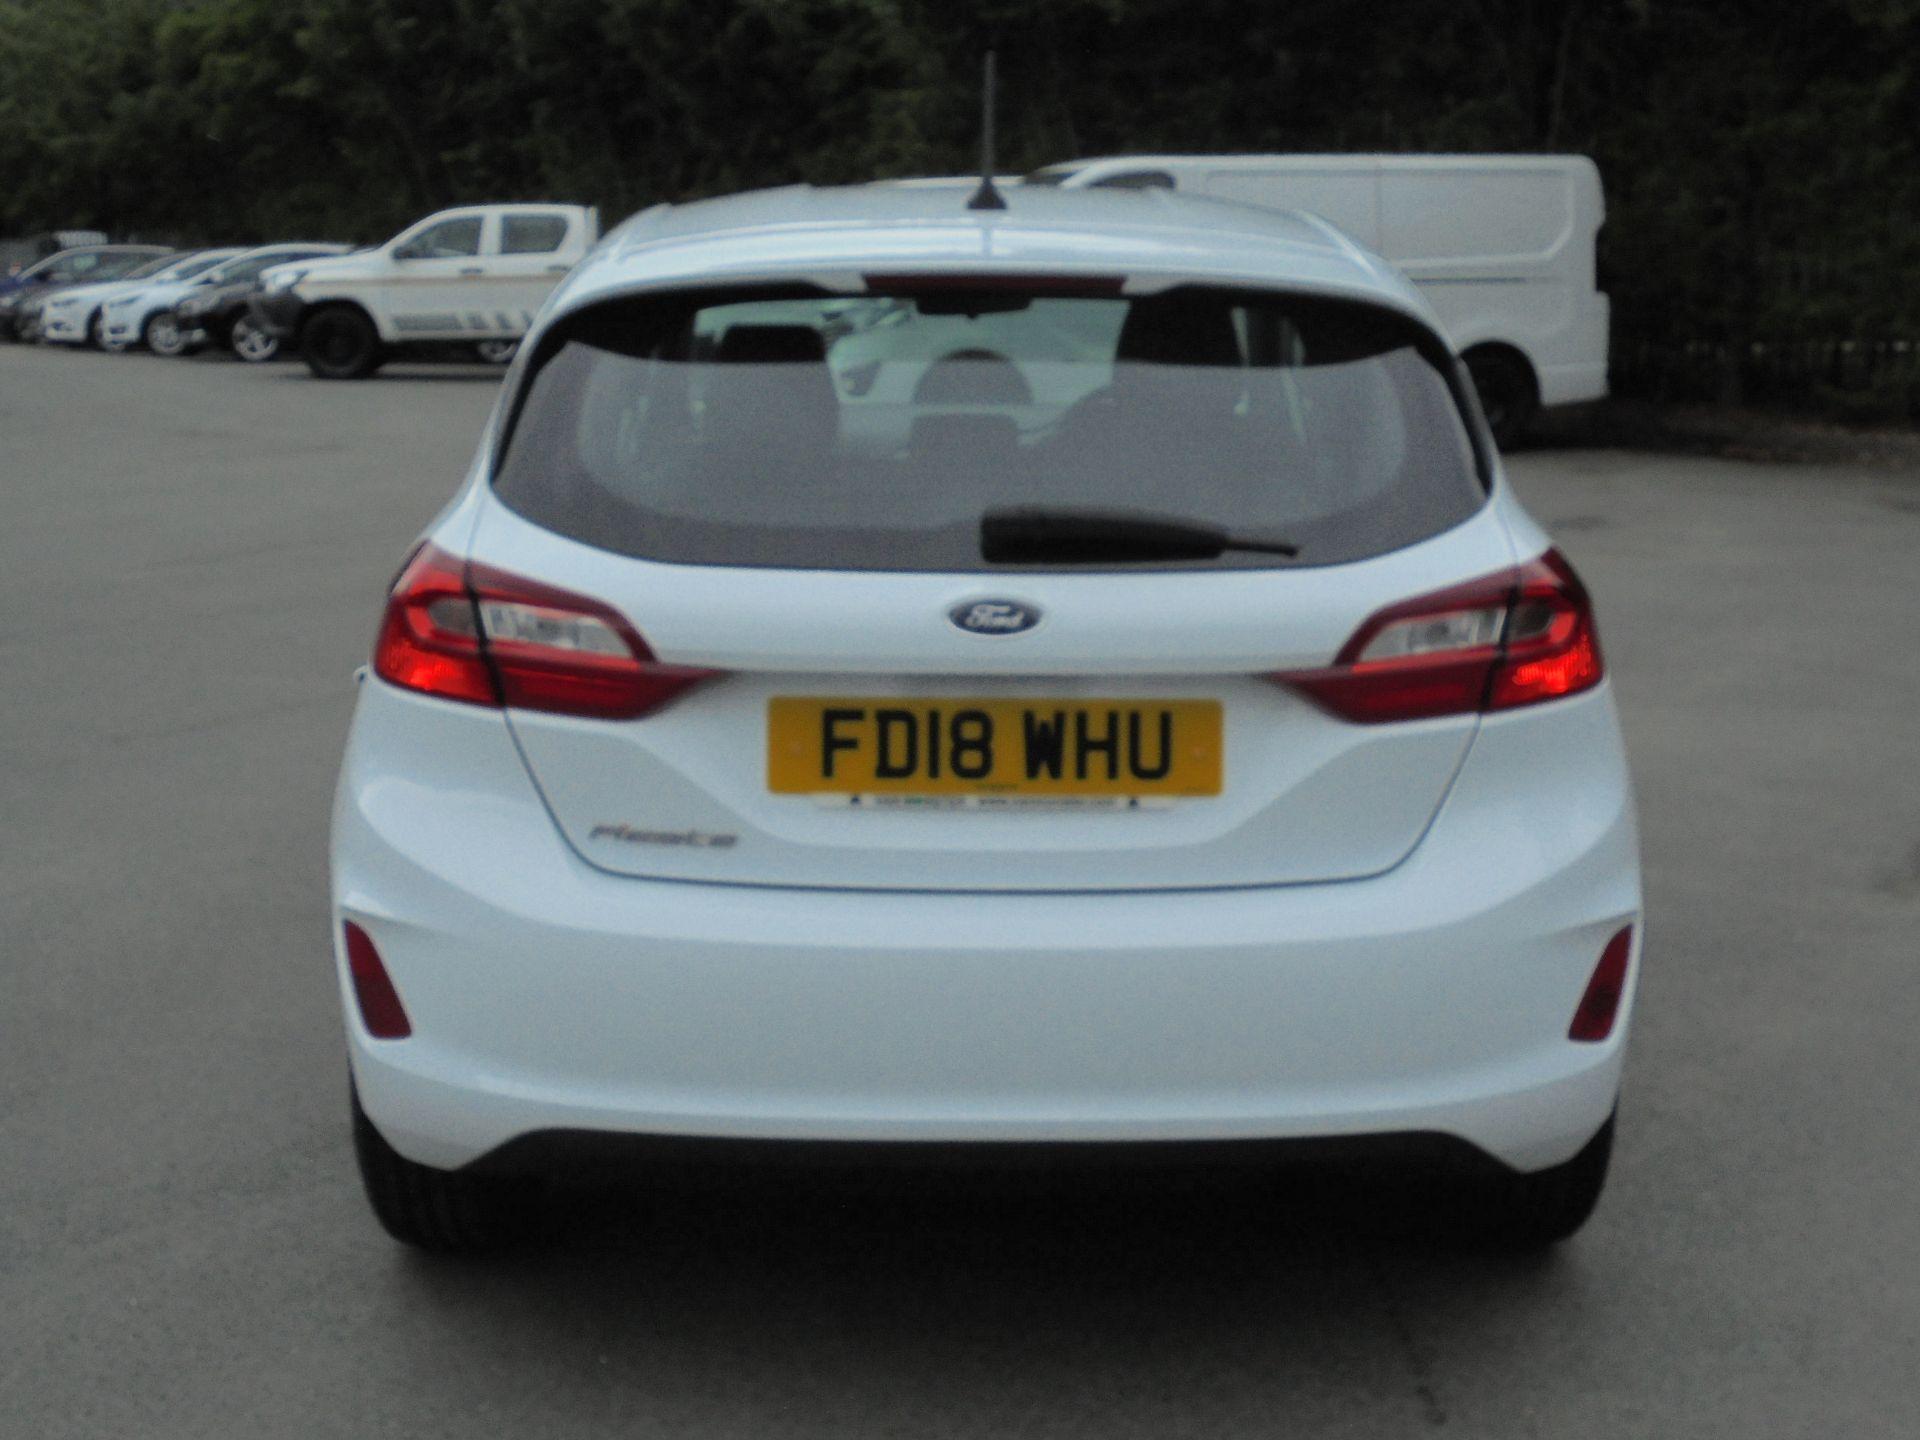 2018 Ford Fiesta 1.5 Tdci Zetec 5Dr (FD18WHU) Image 7